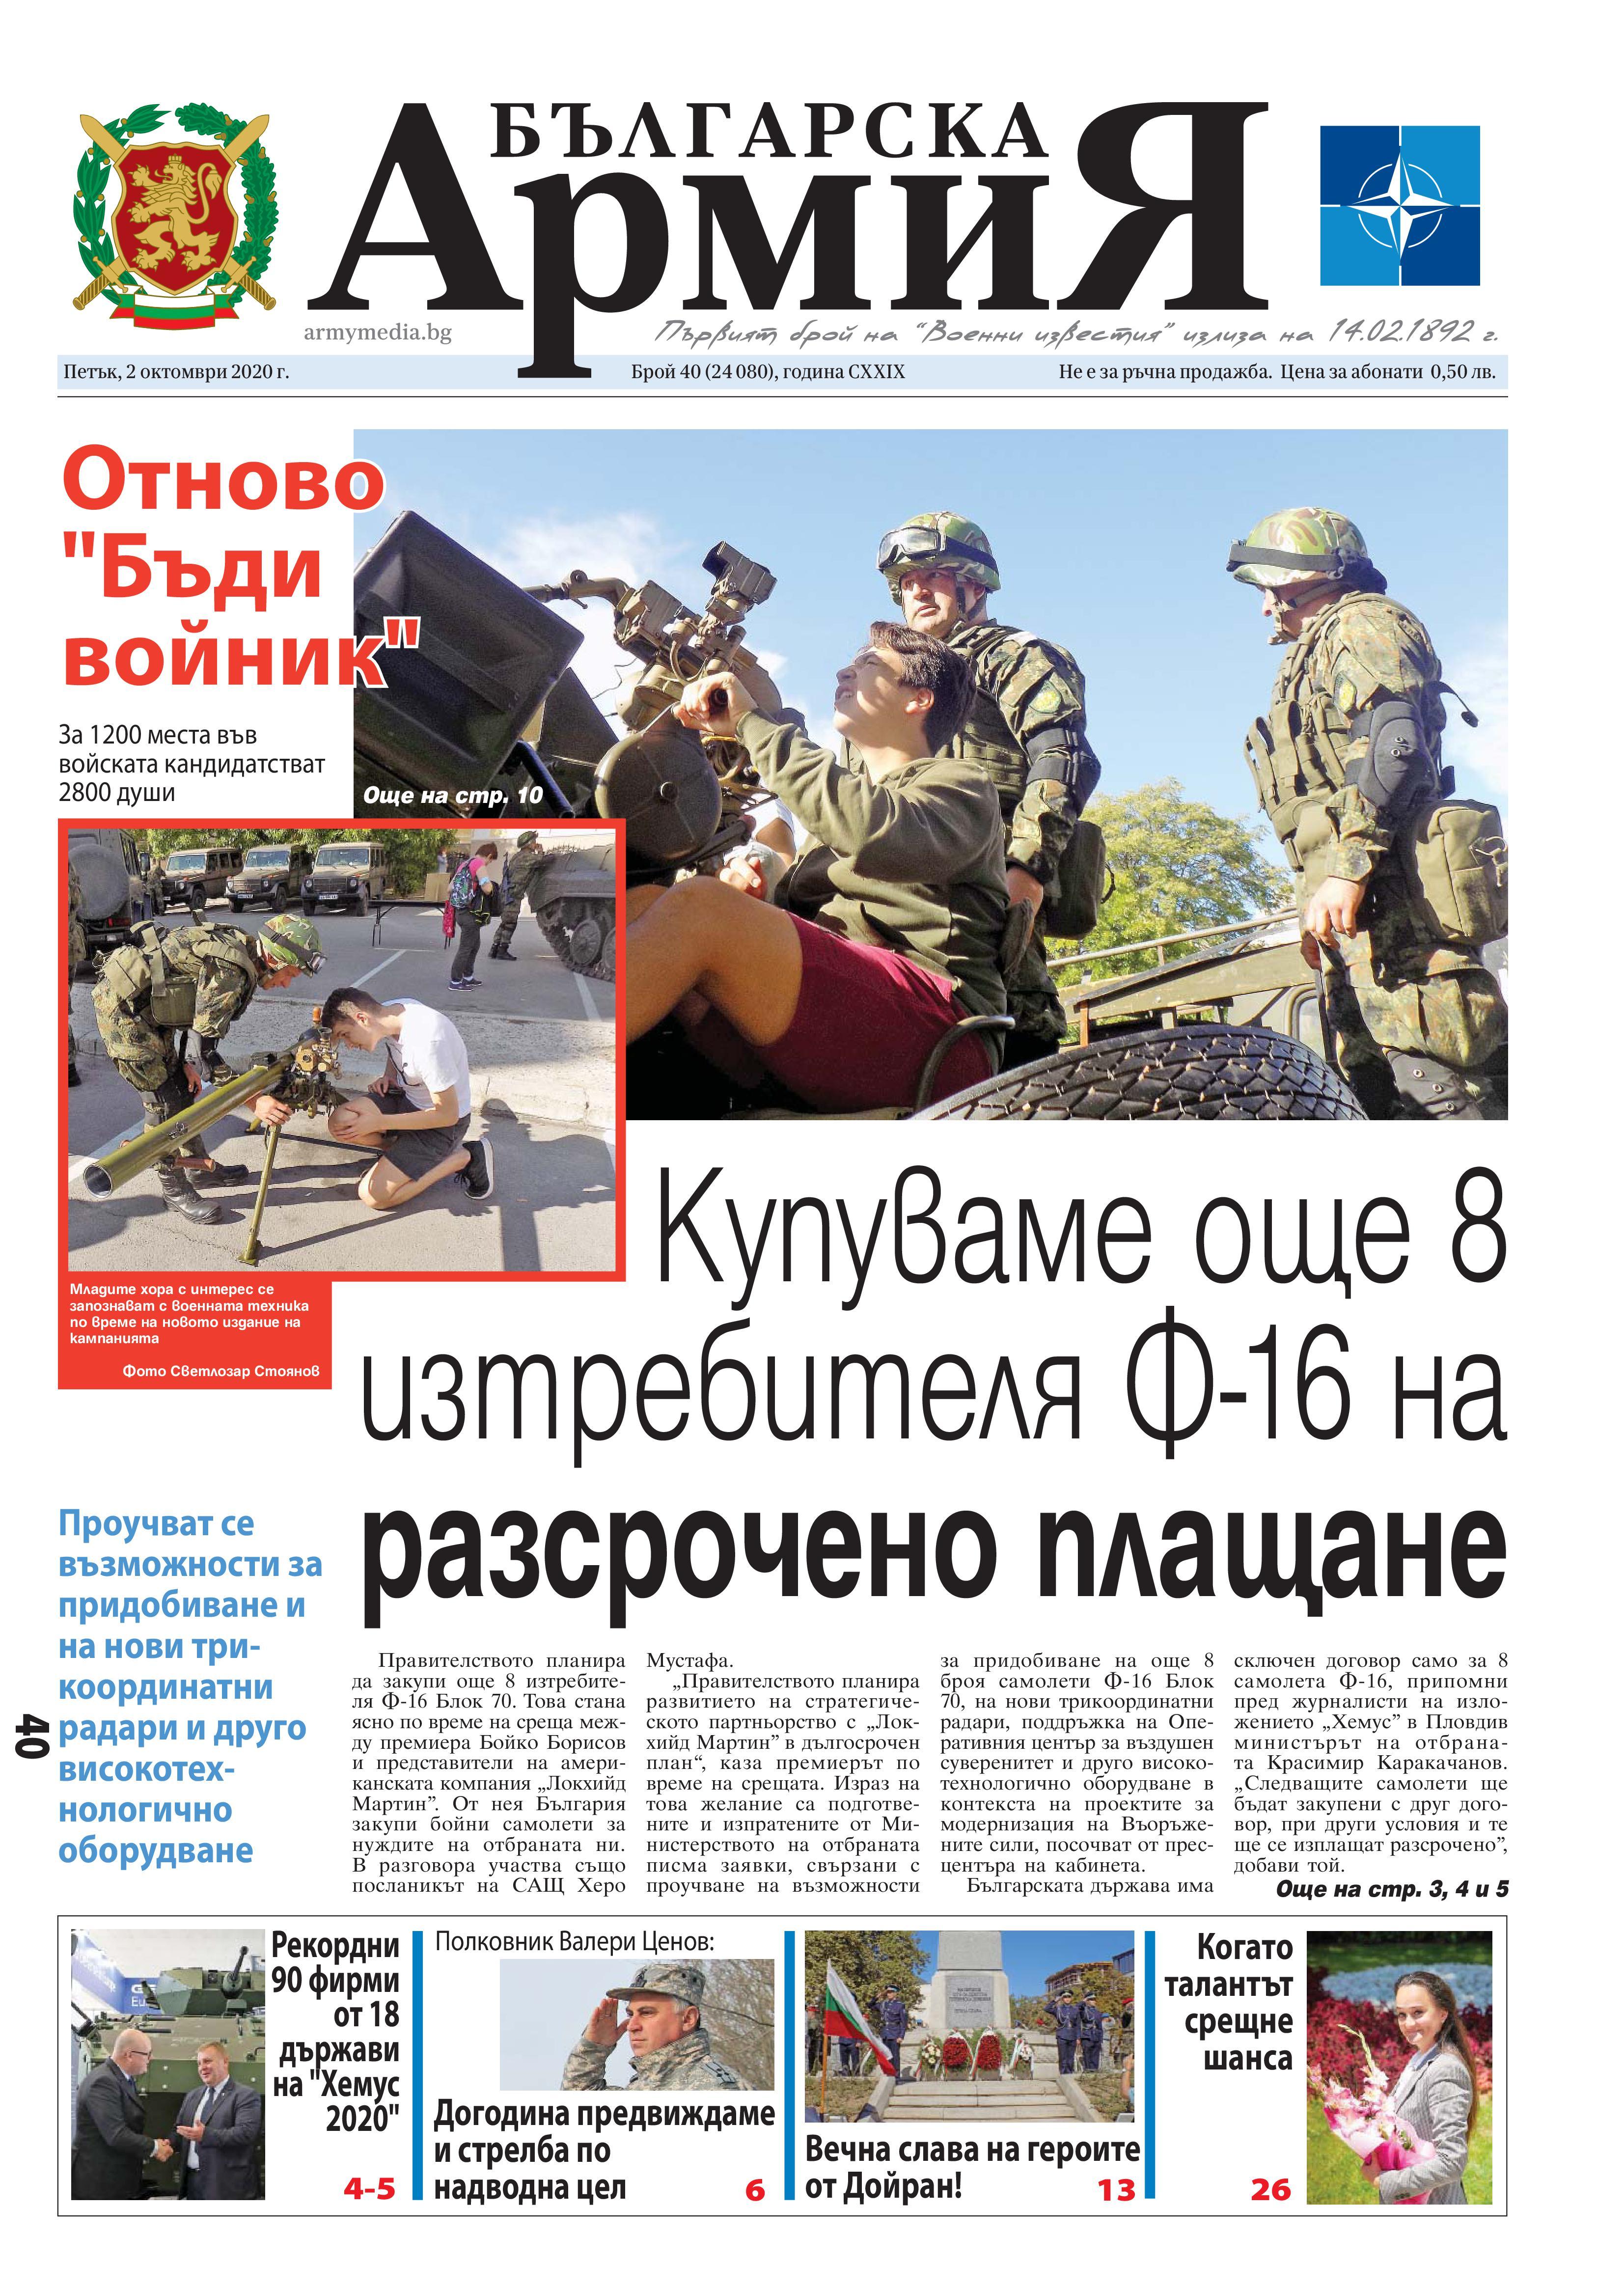 https://armymedia.bg/wp-content/uploads/2015/06/01-41.jpg